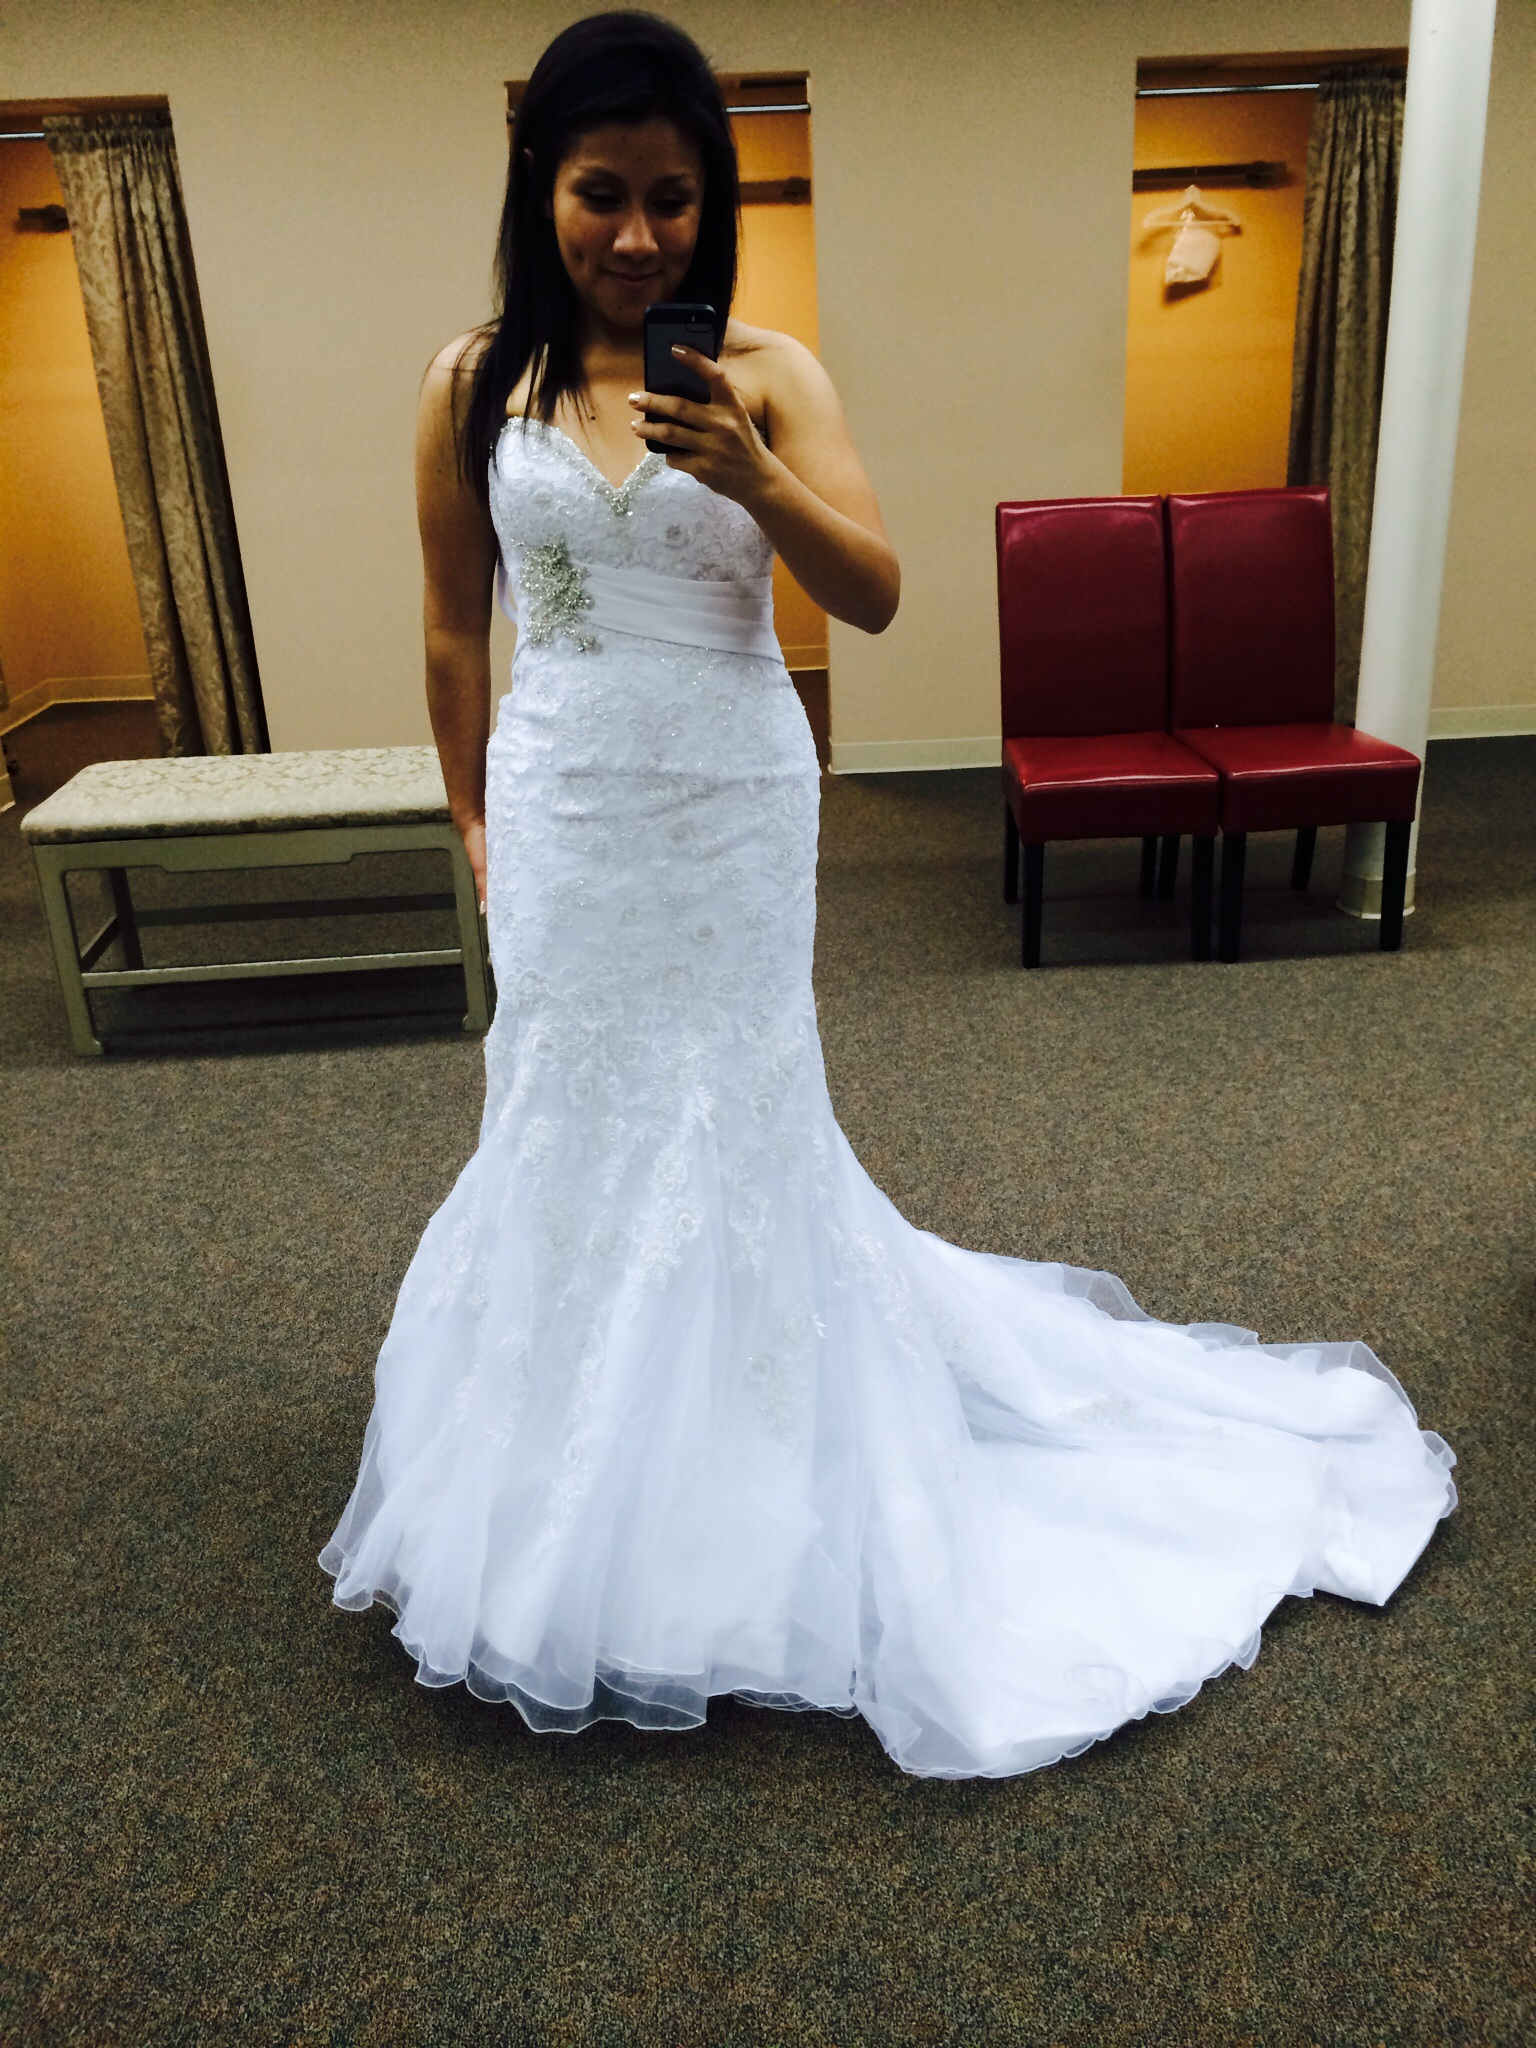 petite brides show me your trumpetfit and flare wedding dress wedding dresses for petite Petite brides show me your trumpet fit and flare wedding dress